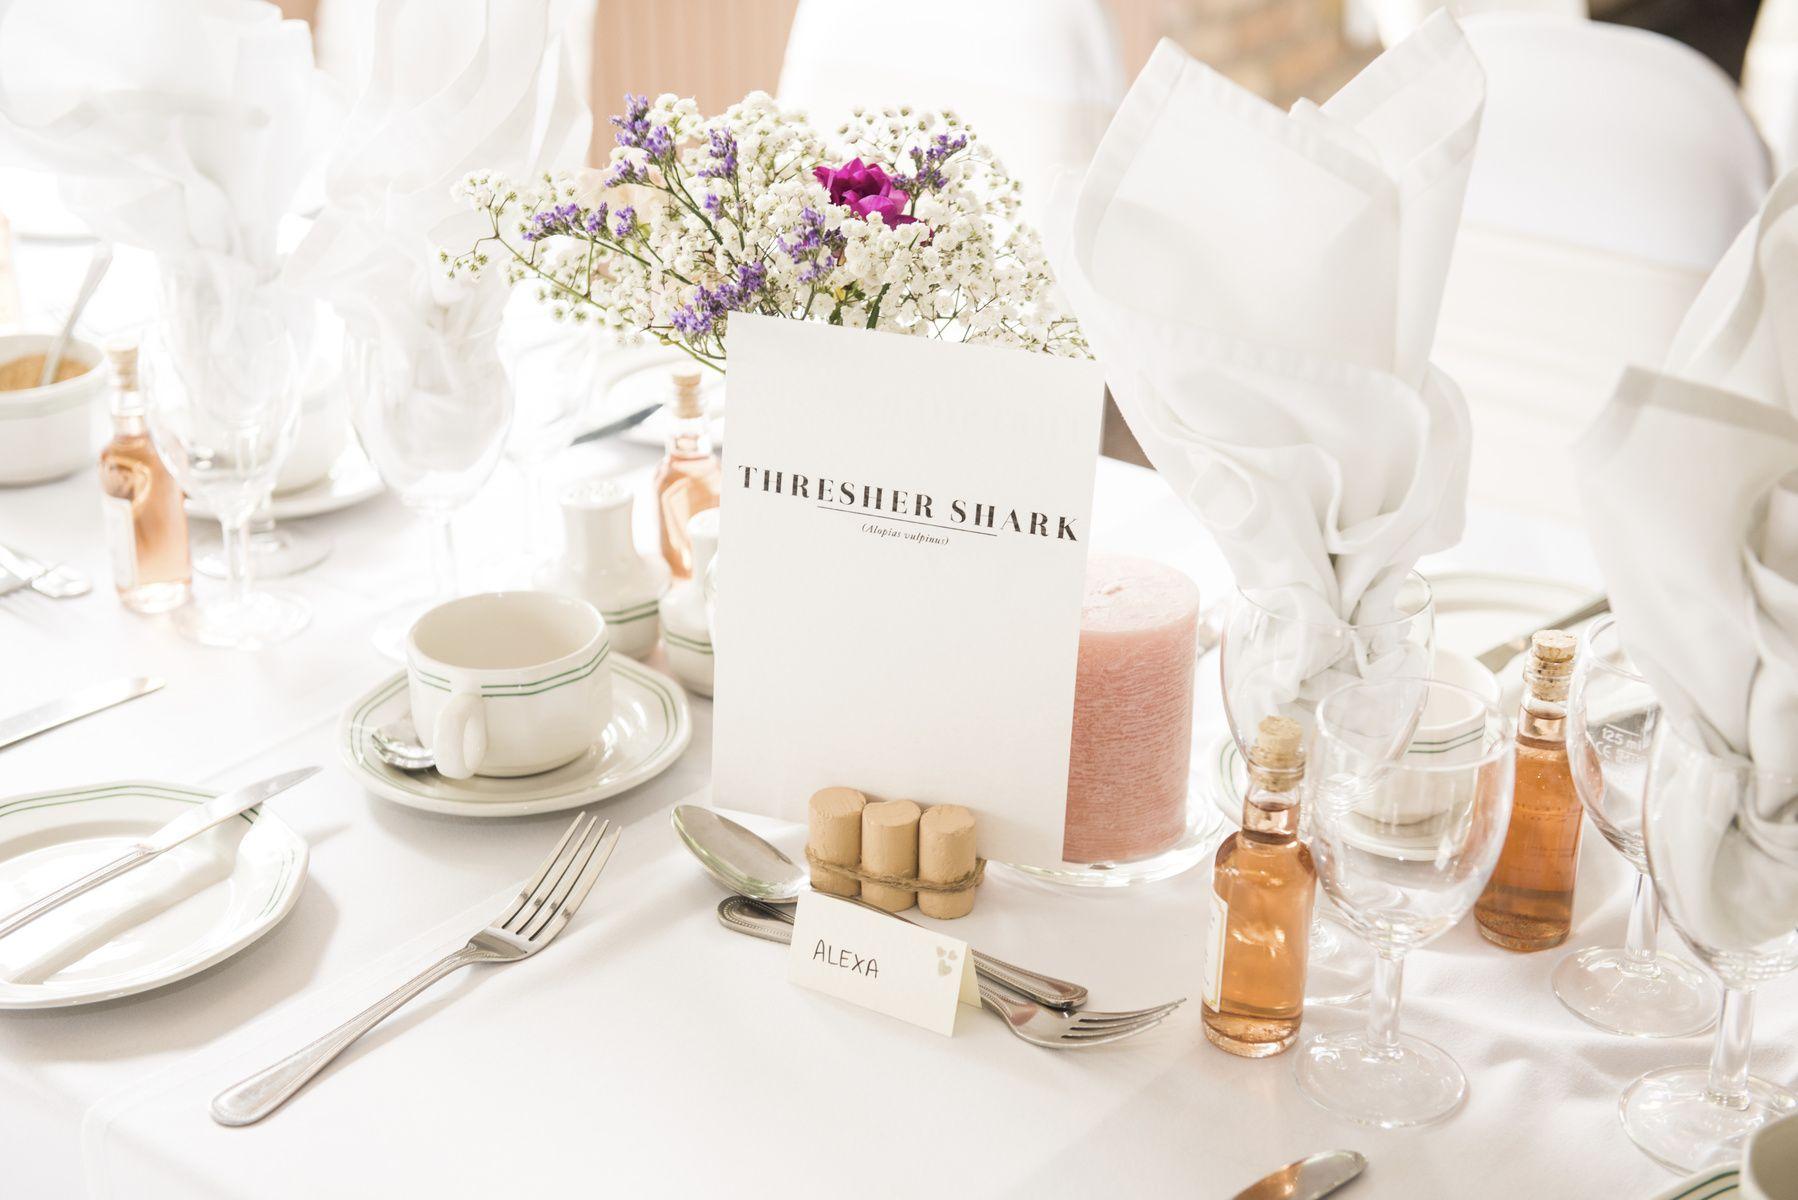 Rose Images Wedding Photography  - Portfolio - Sally Rose - Table Details - Wedding - Sharks - London  www.roseimages.co.uk